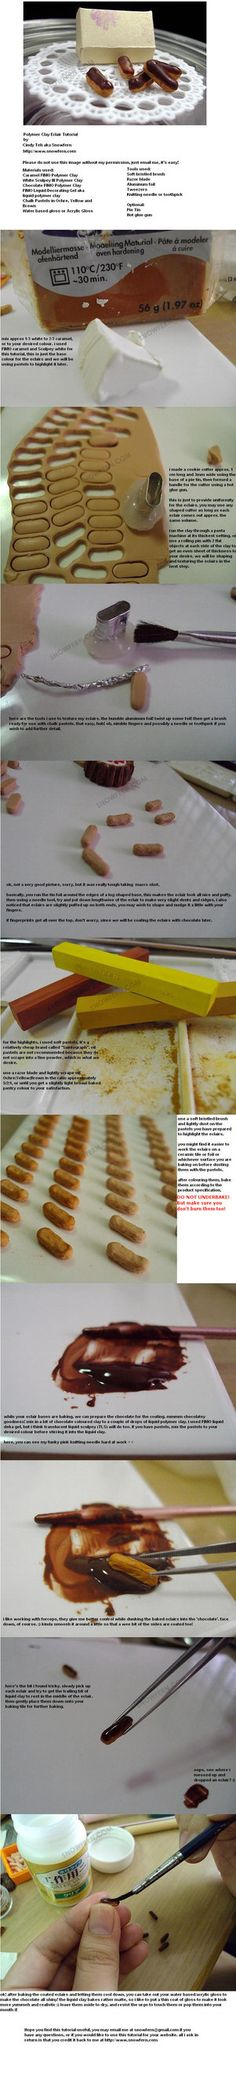 Polymer Clay Eclair Tutorial by ~Snowfern on deviantART